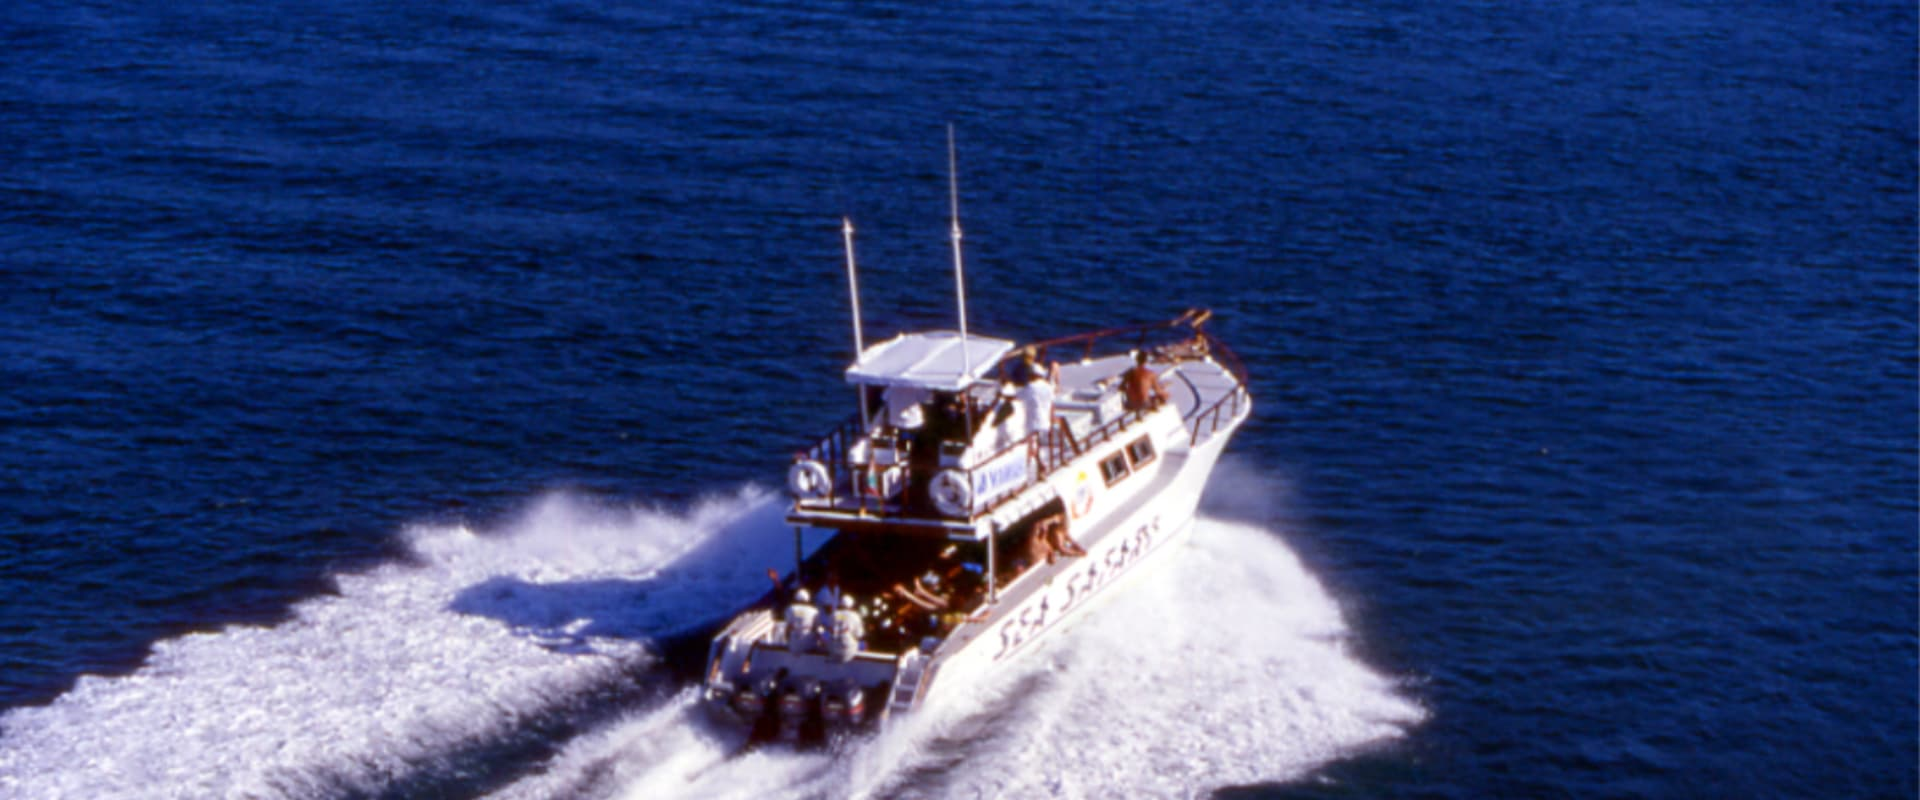 Challenge yourself with some Deep Sea Fishing